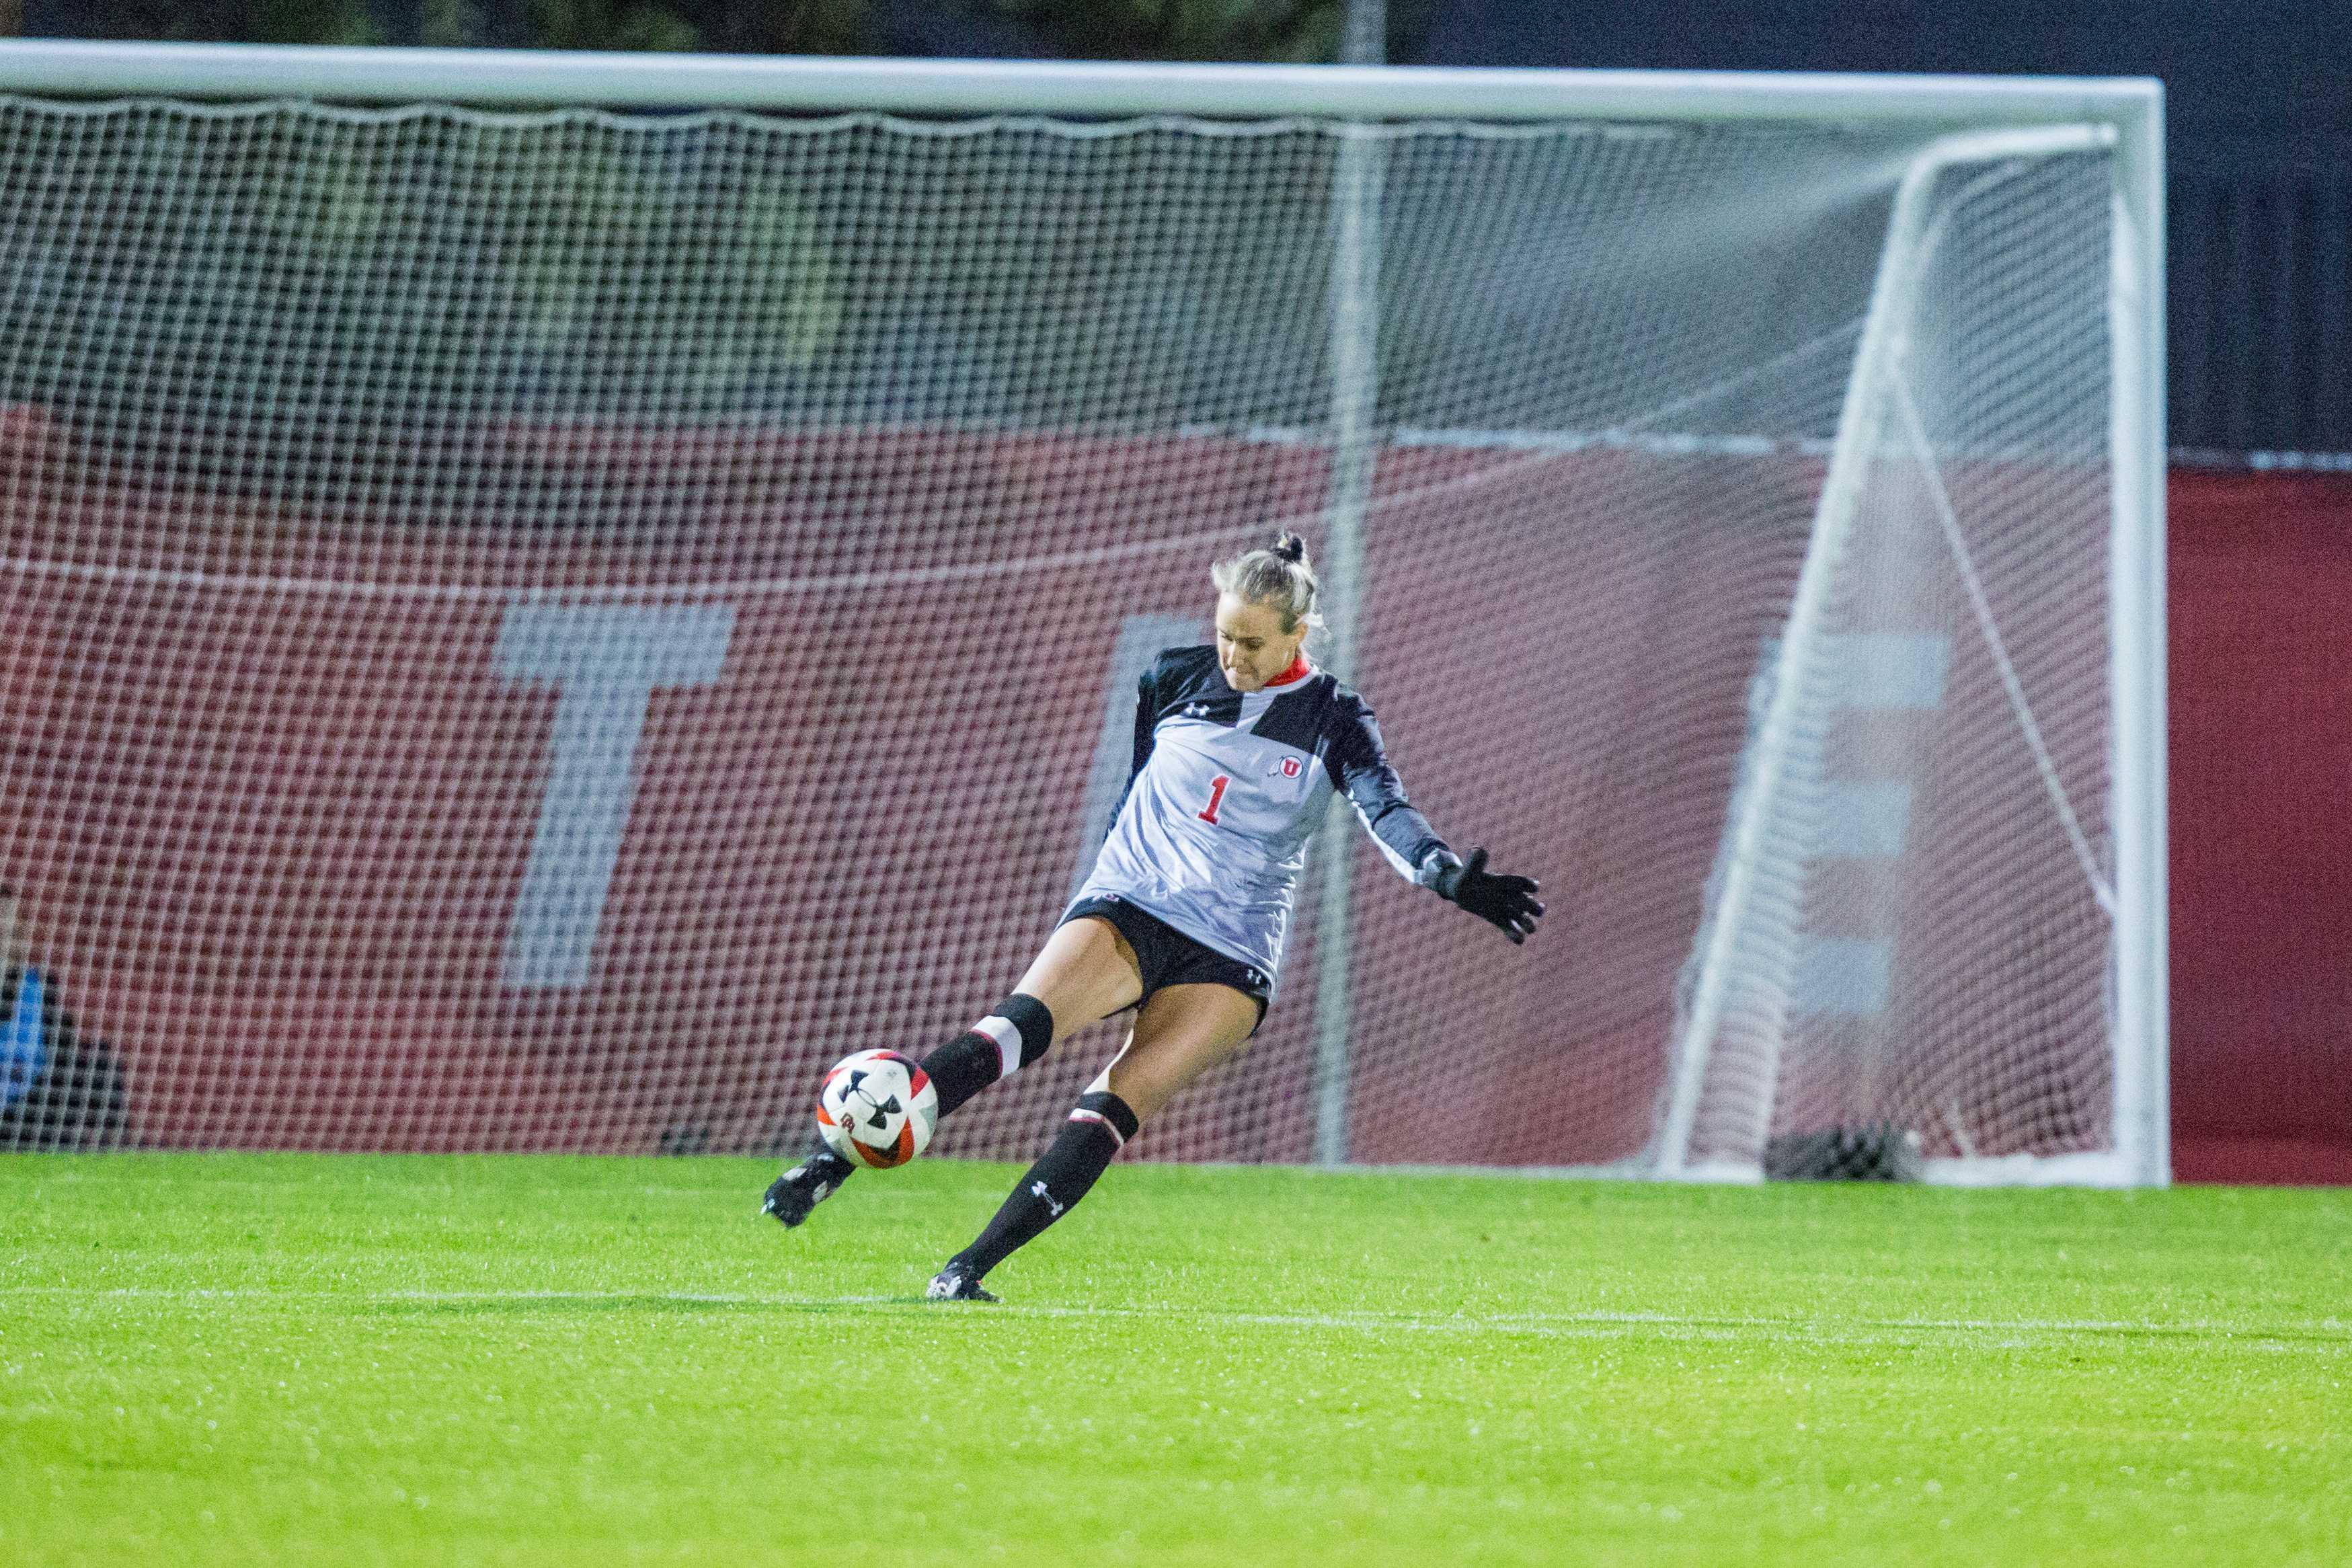 University of Utah Junior Goalkeeper Carly Nelson (1) passed the ball in an NCAA Women's Soccer game vs. Washington at Ute Soccer Field in Salt Lake City, UT on Thursday October 04, 2018.  (Photo by Curtis Lin   Daily Utah Chronicle)